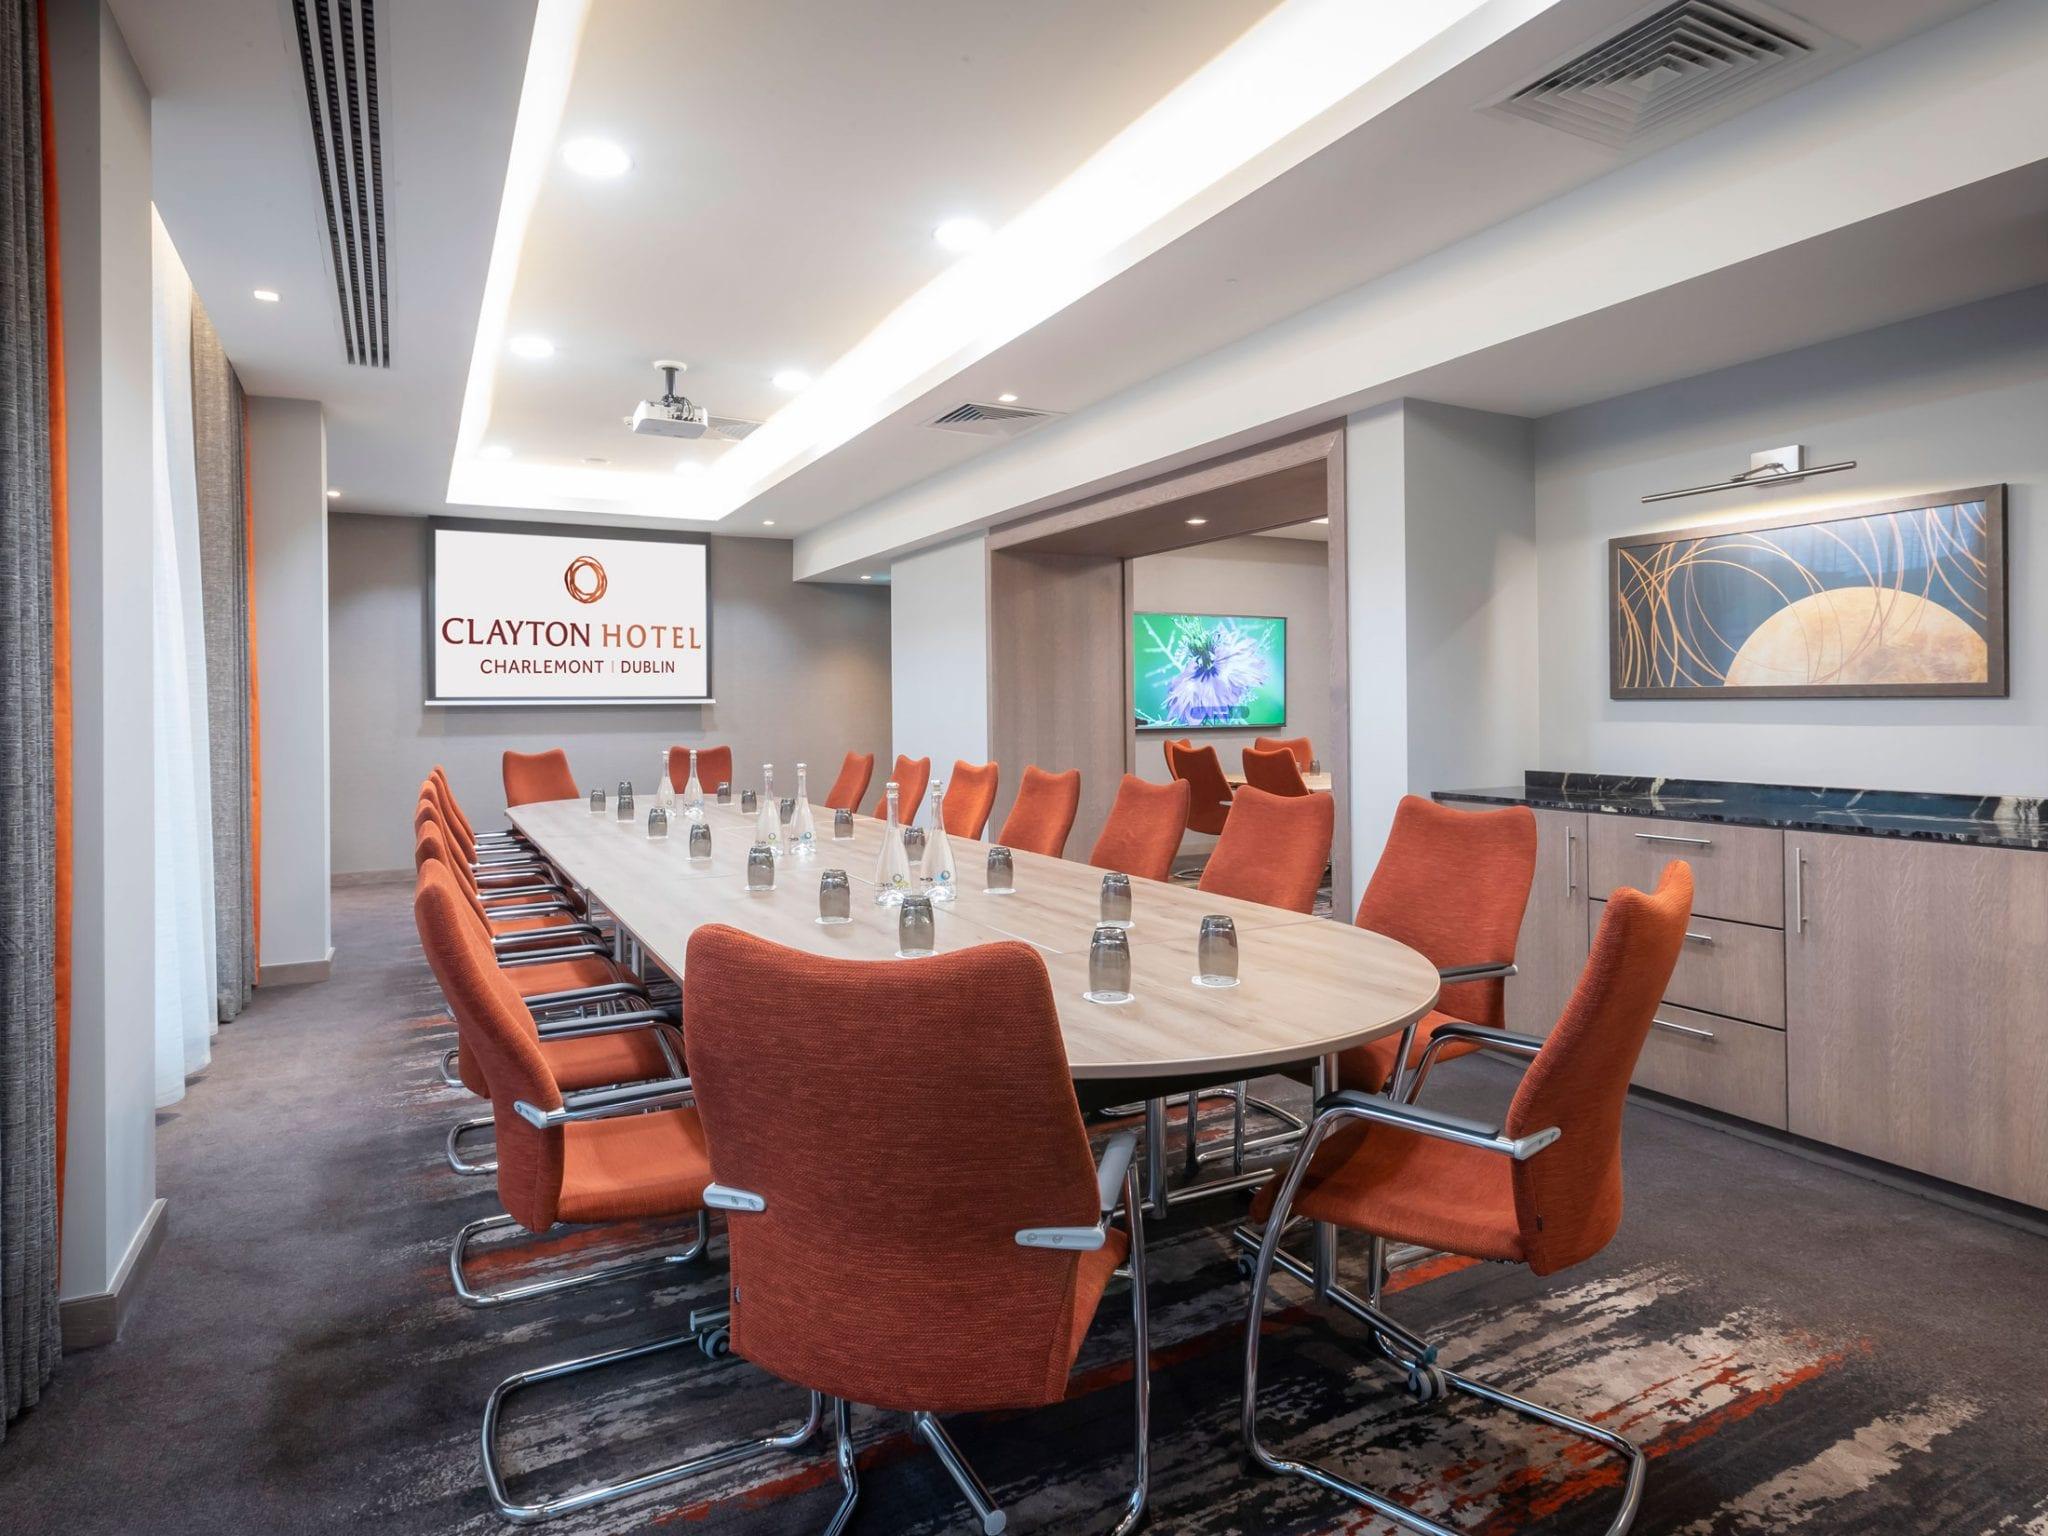 Meeting room at Clayton Hotel Charlemont